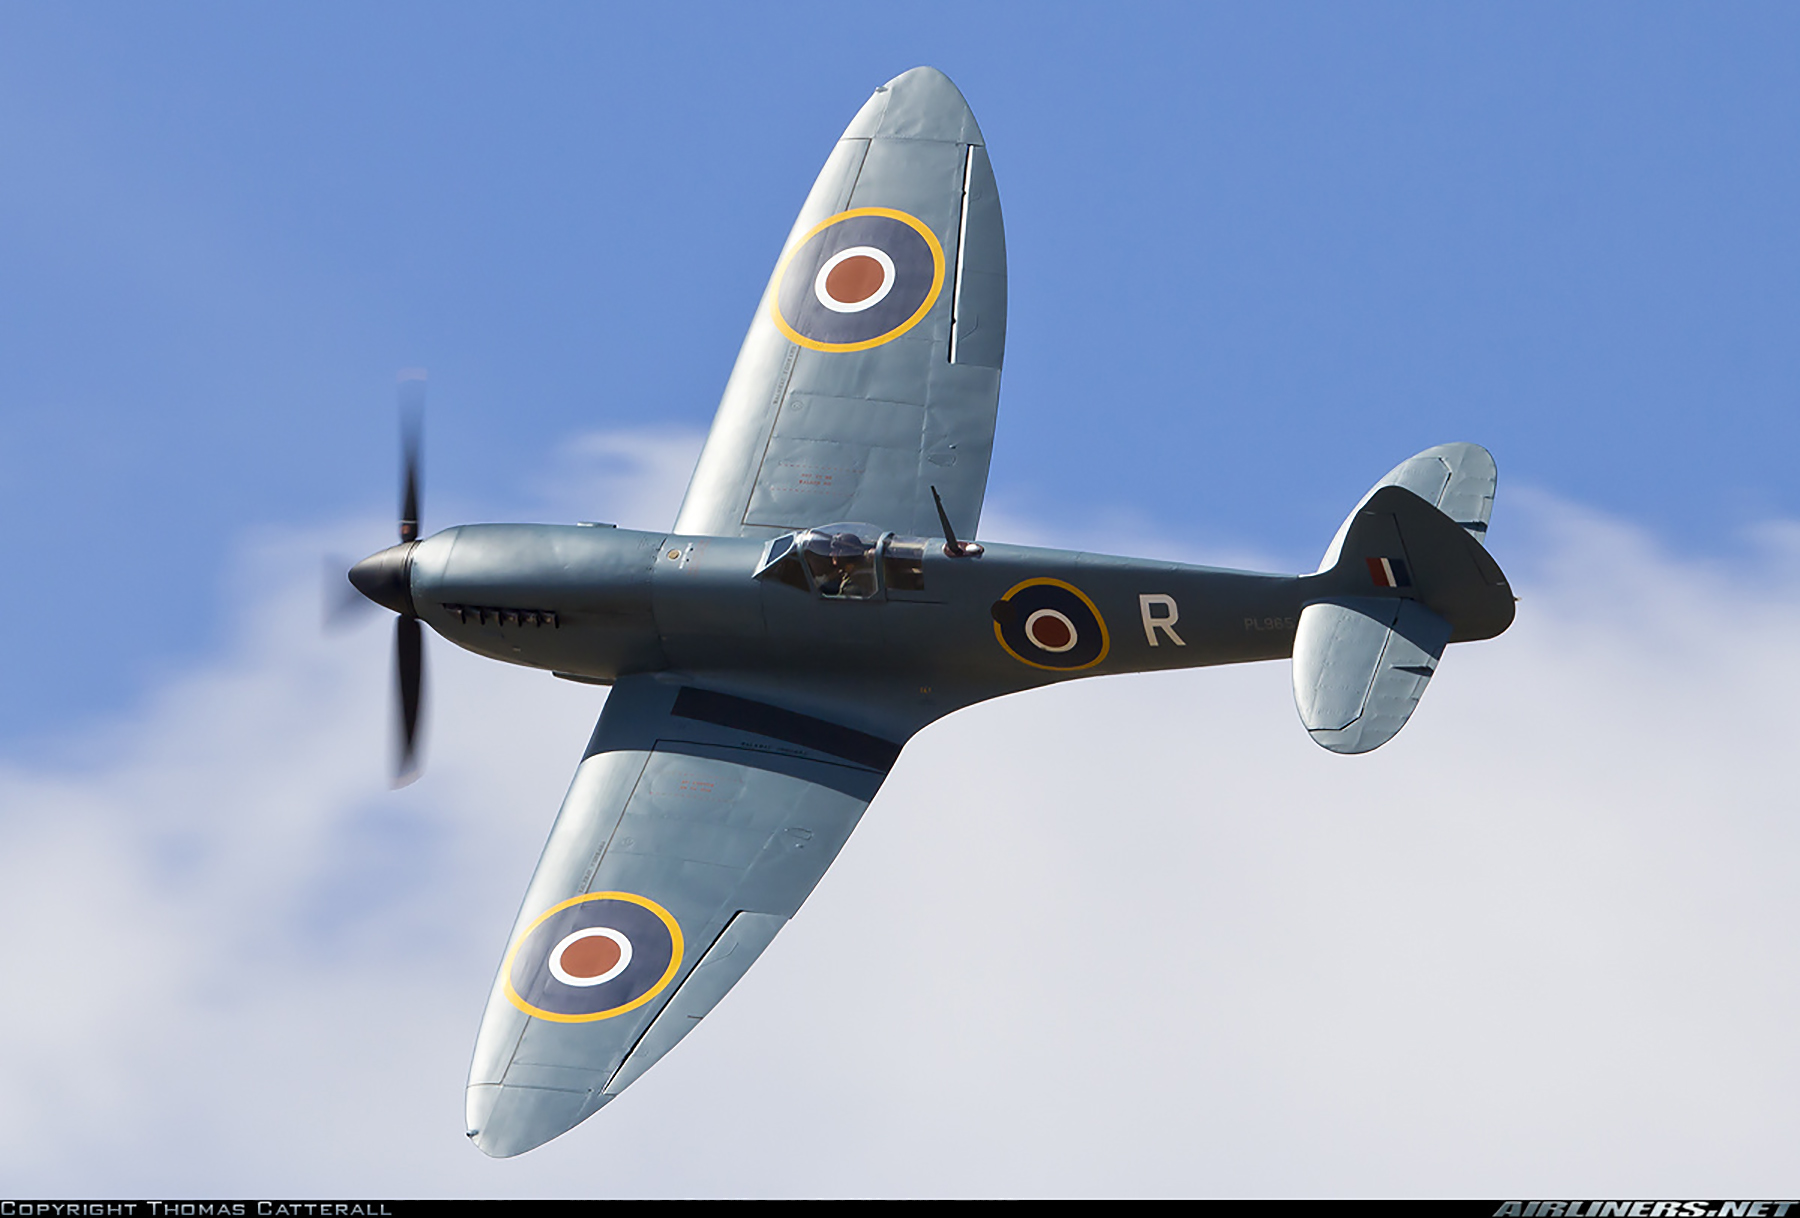 Airworthy Spitfire warbird PRXI RAF 16Sqn R PL965 pre D day 05